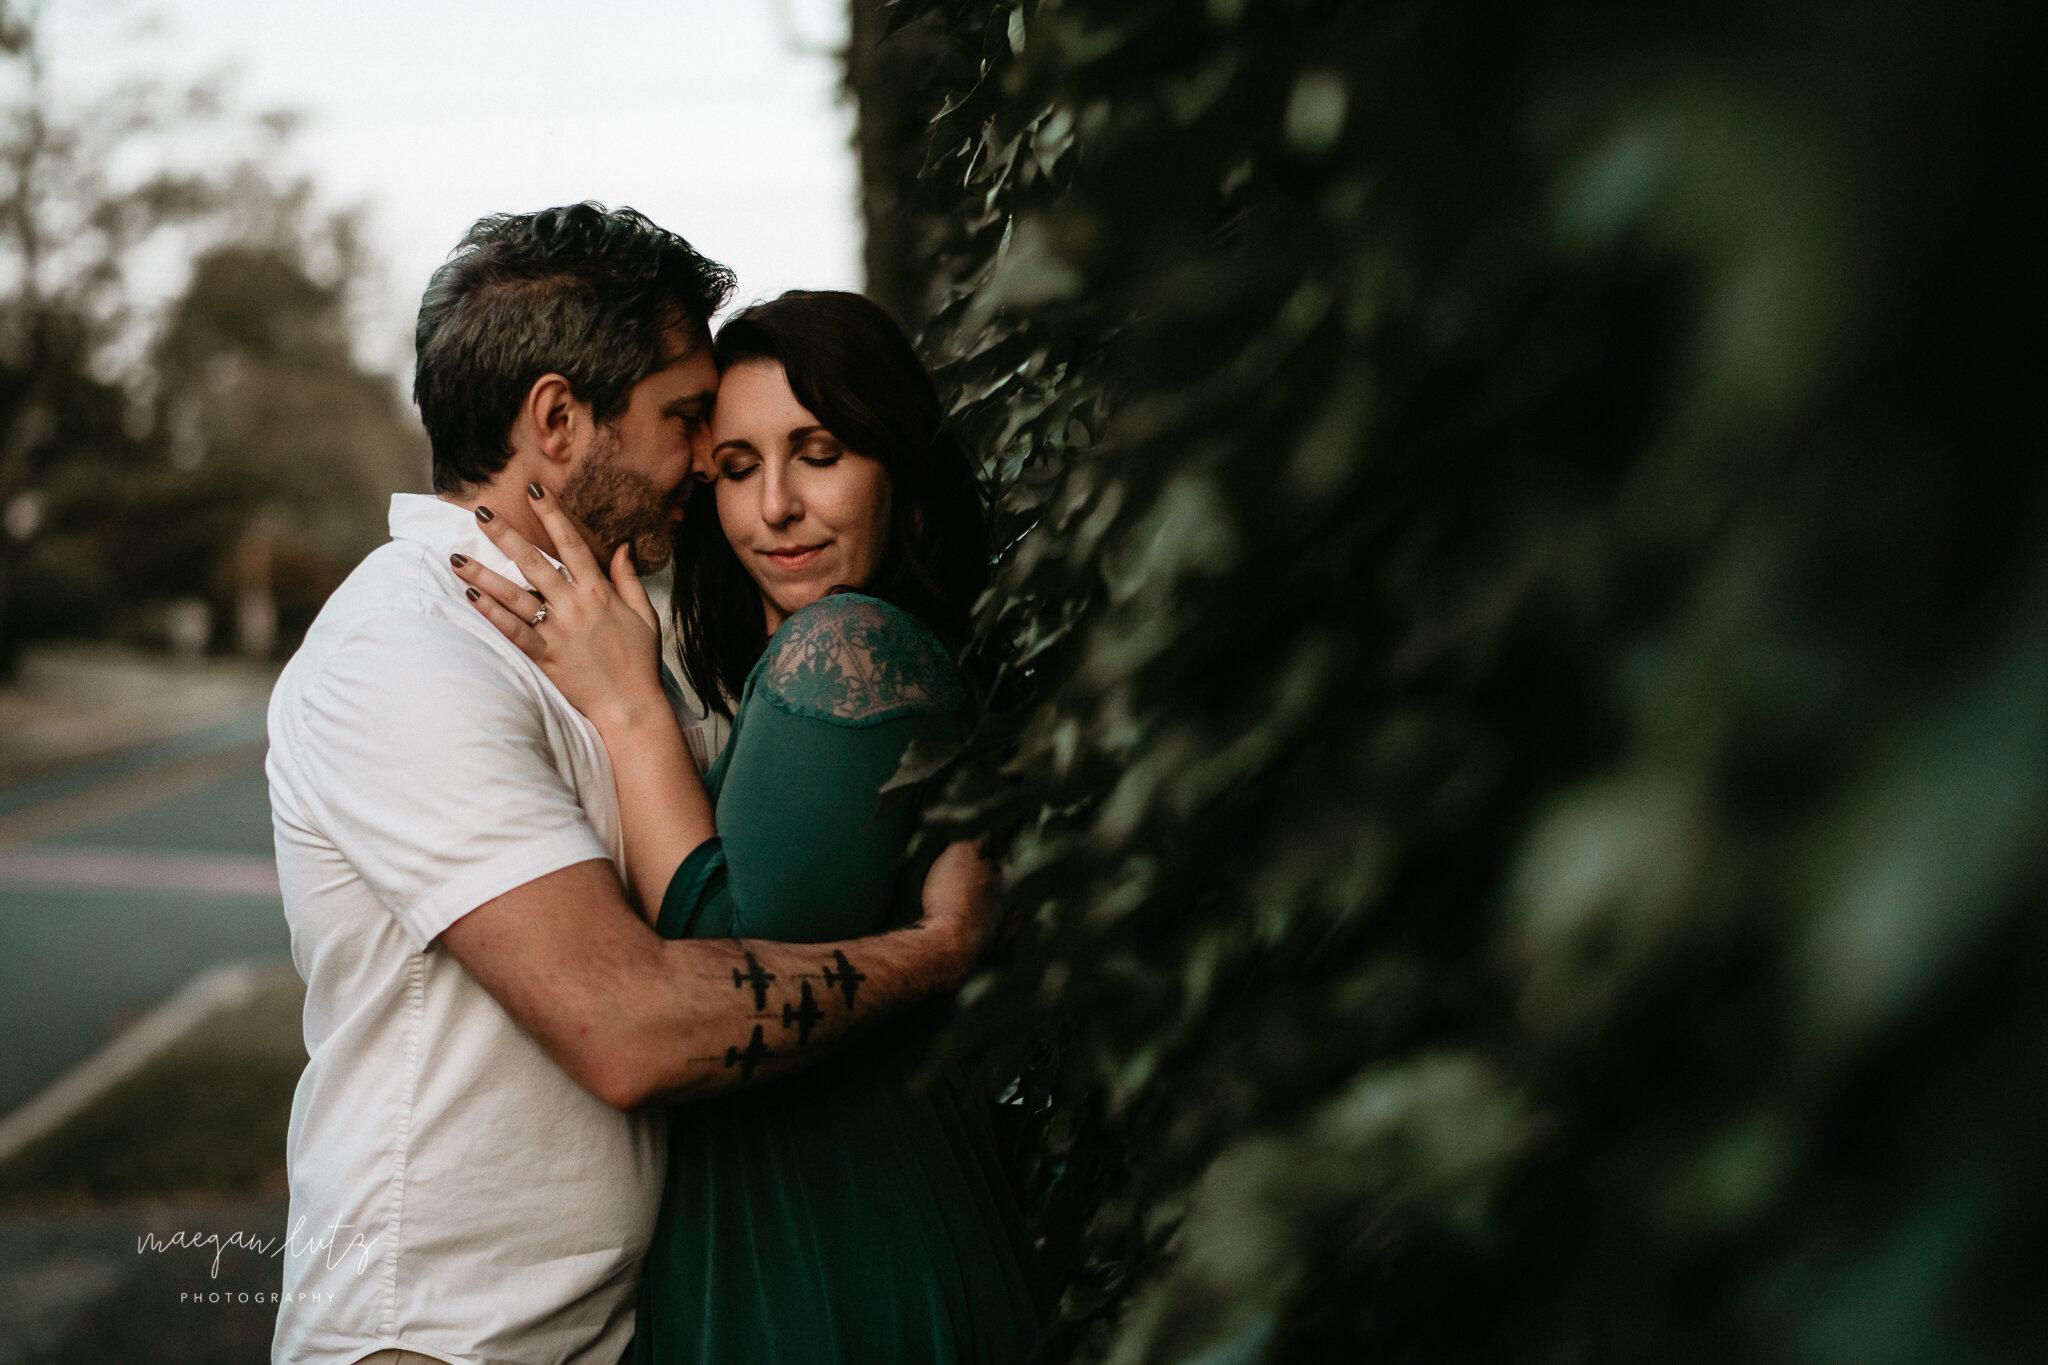 NEPA-Lehigh-Valley-Wedding-Engagement-photographer-at-the-rose-garden-allentown-PA-42.jpg